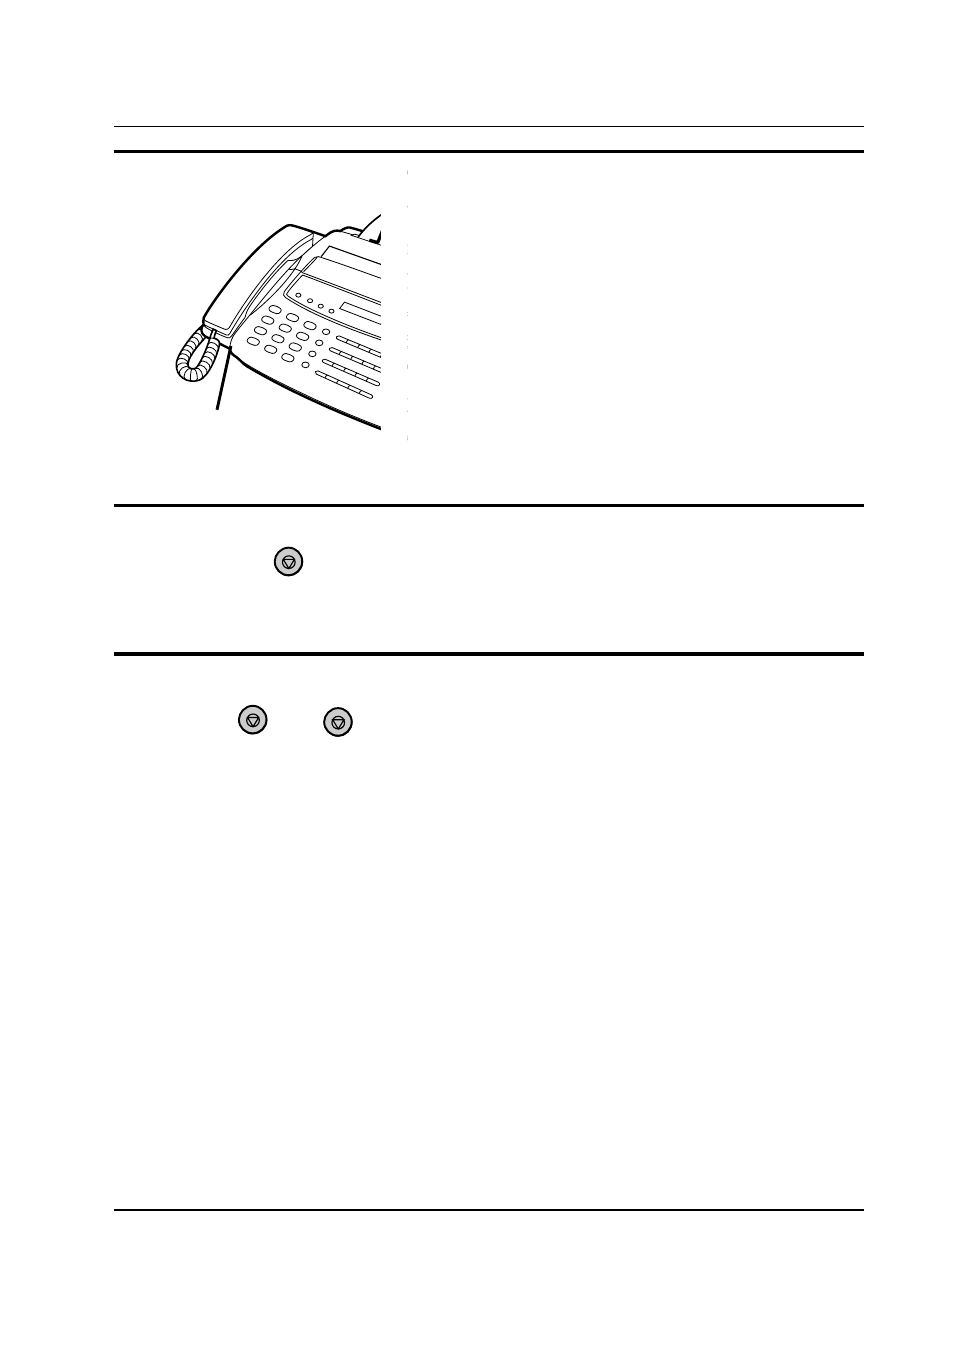 Sharp Fo 61 Инструкция